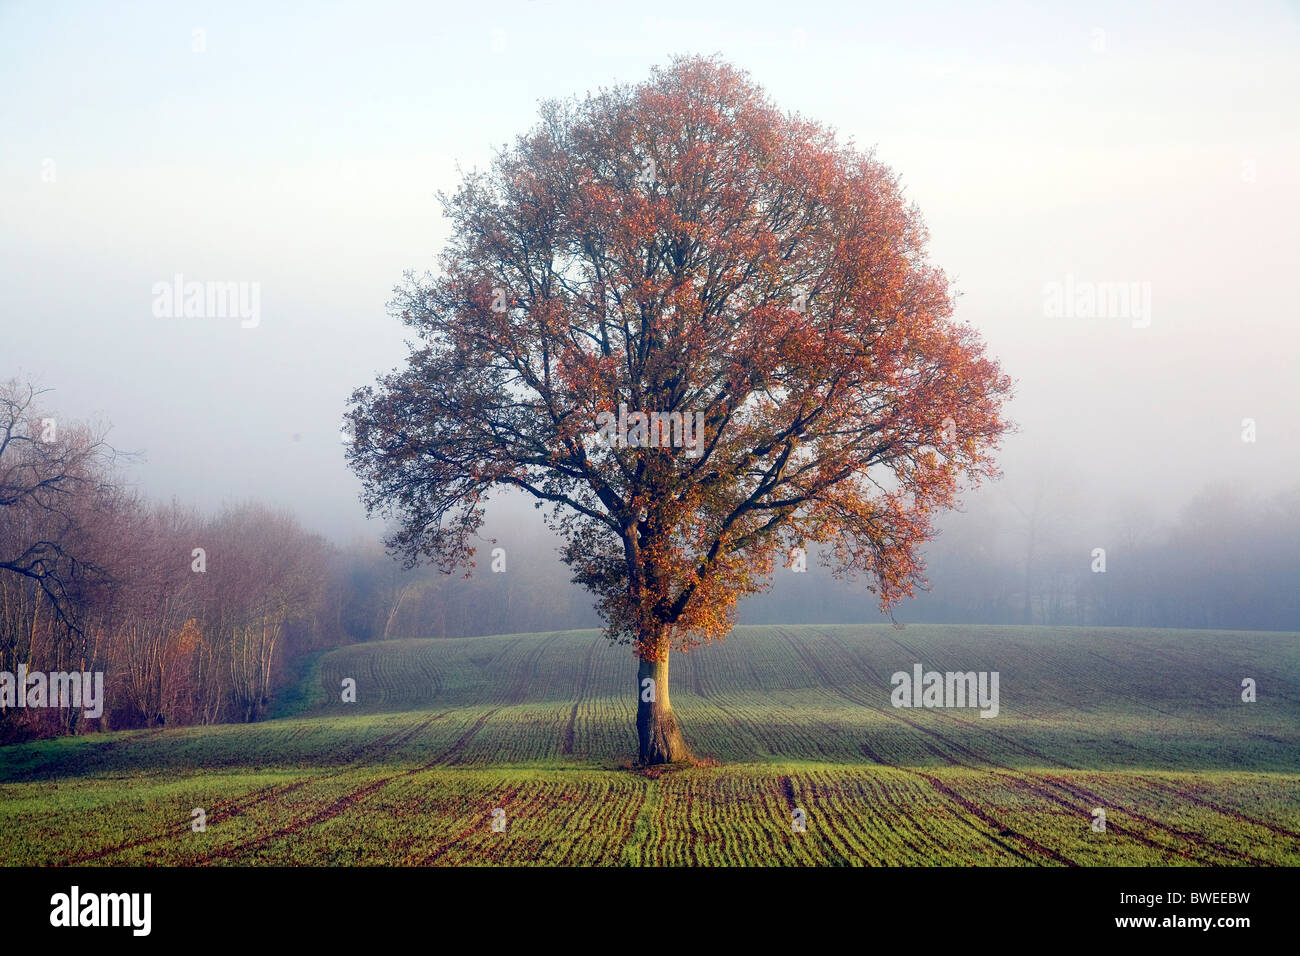 Eiche im goldenen Herbst farbige Blatt am nebligen Morgen in neu genähte Weizenfeld in der Weald of Kent UK Stockbild